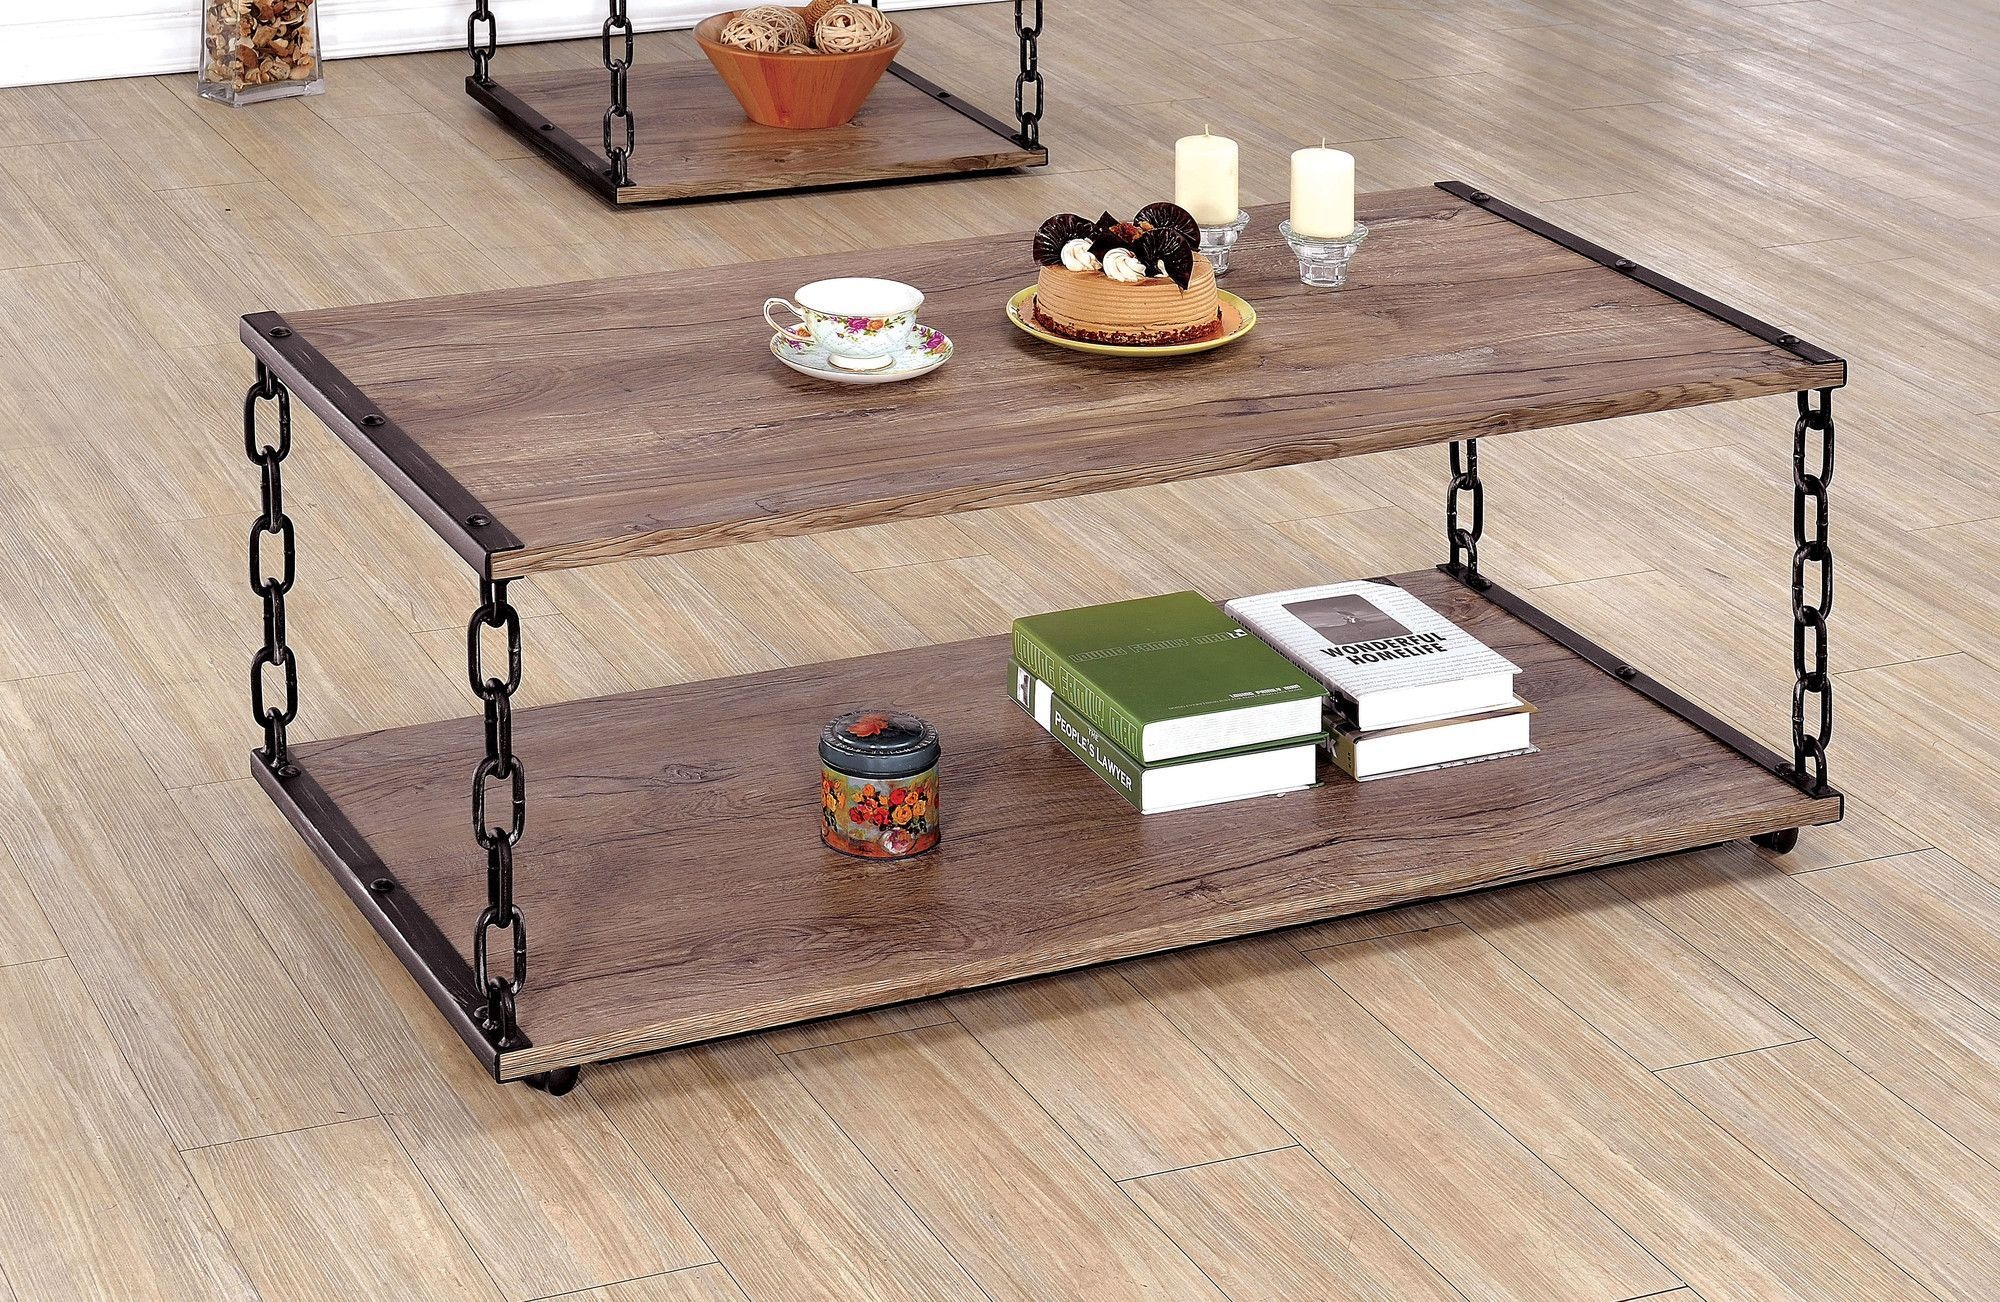 Yuma Coffee Table Rustic Coffee Tables Coffee Table End Table Set Diy Coffee Table